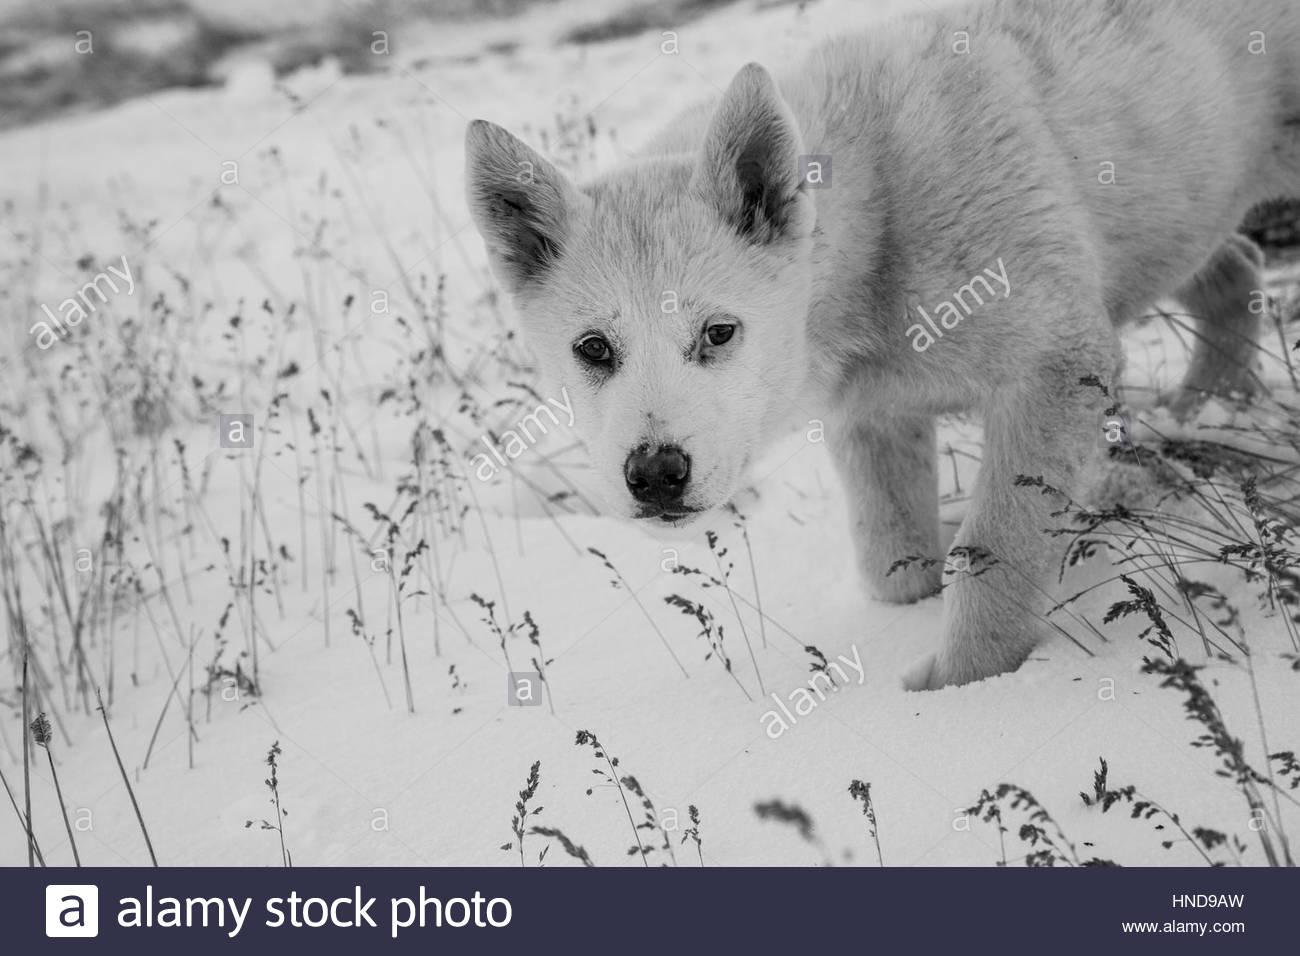 Greenland Sled Dog Puppy - Kalaallit Qimmiat Stock Photo